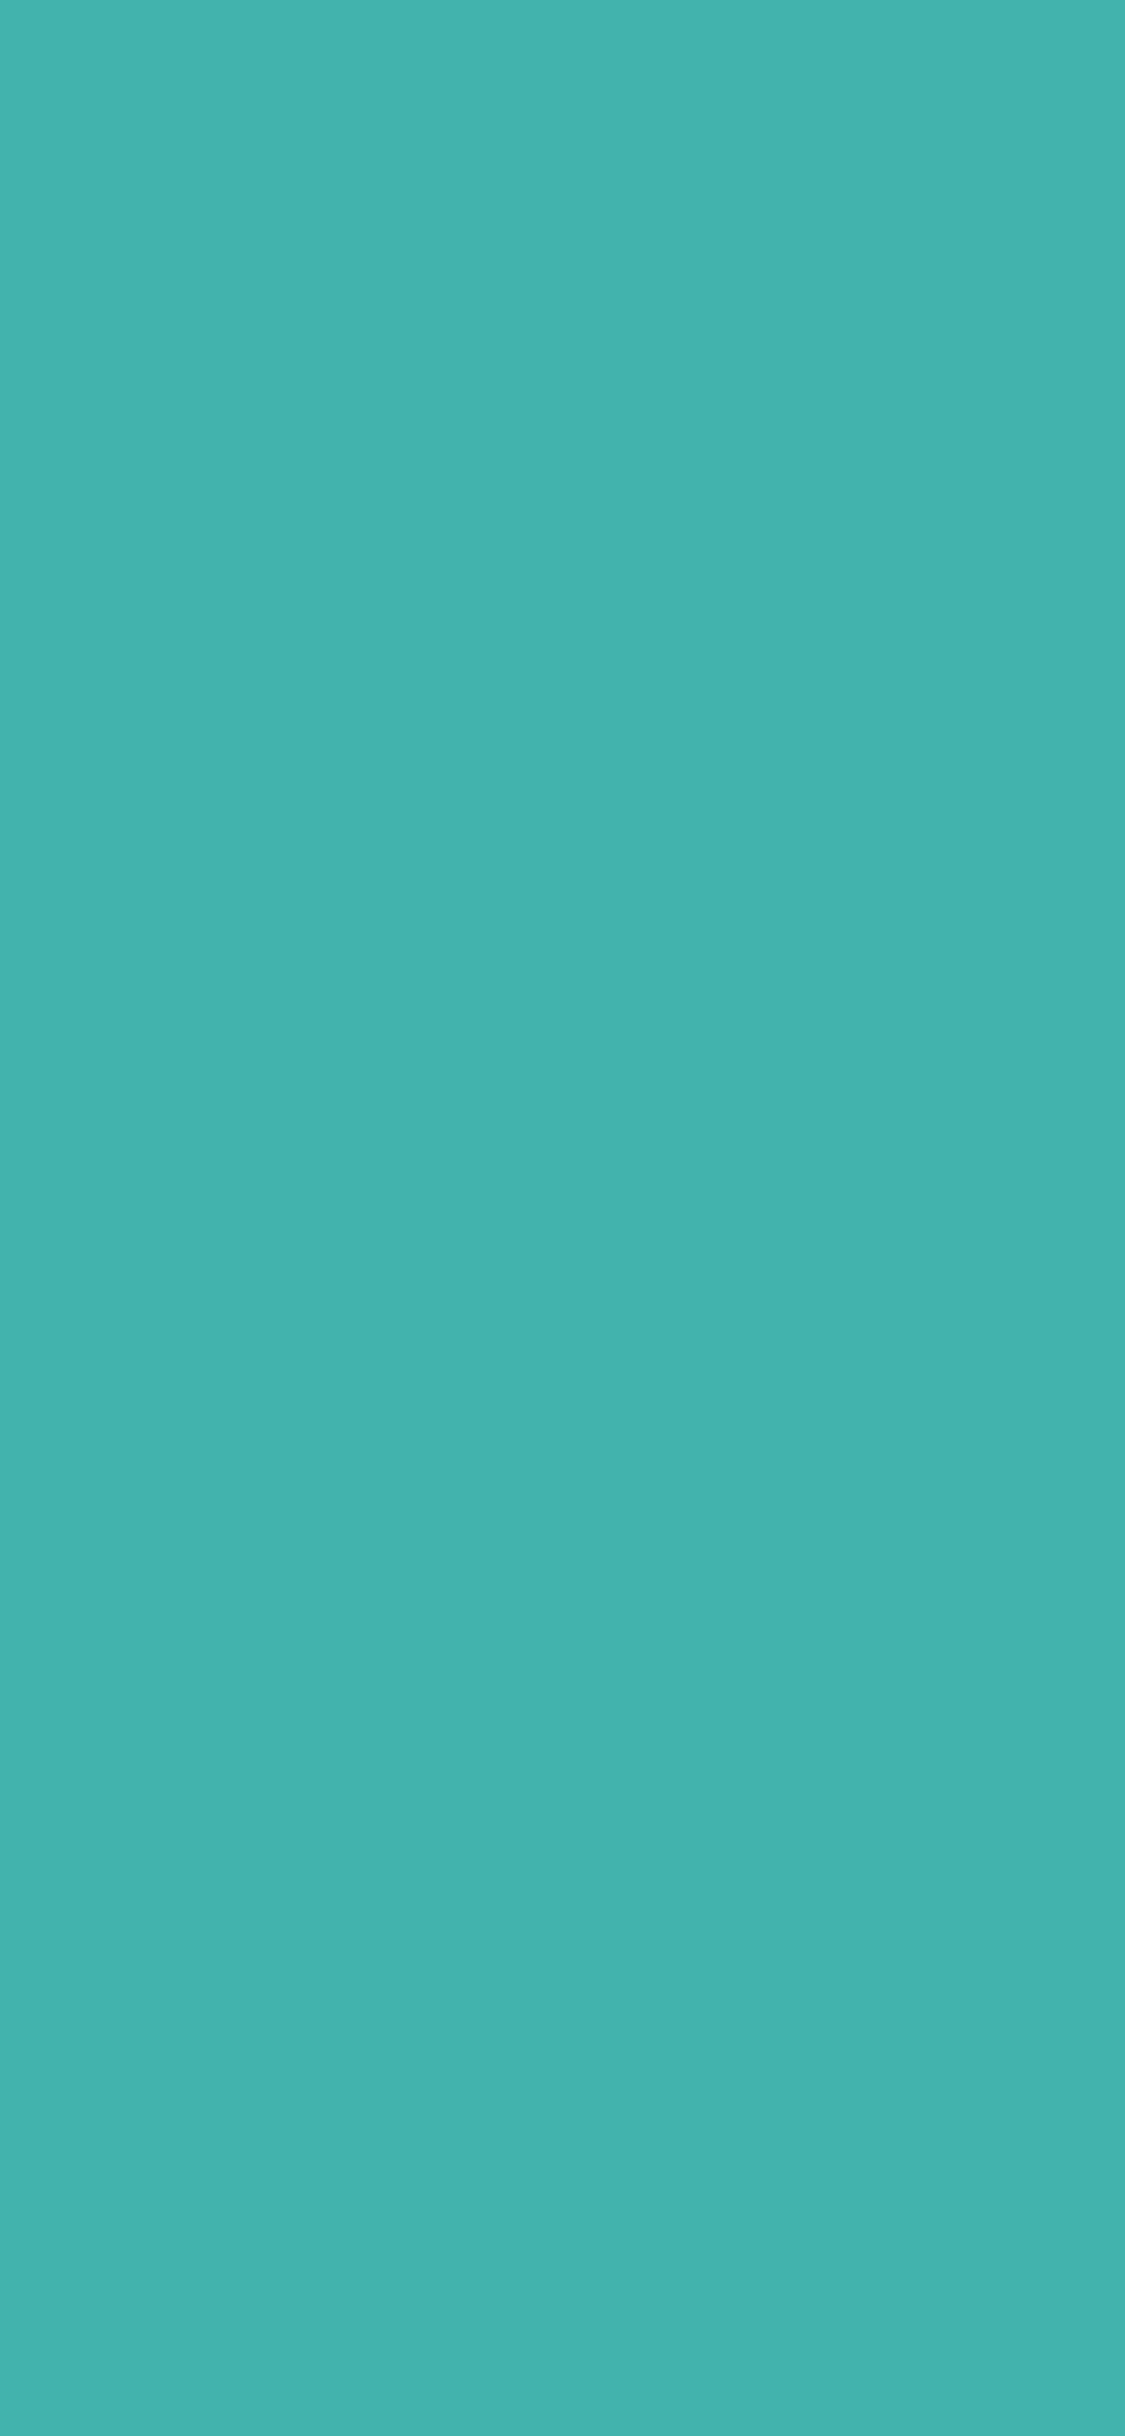 1125x2436 Verdigris Solid Color Background